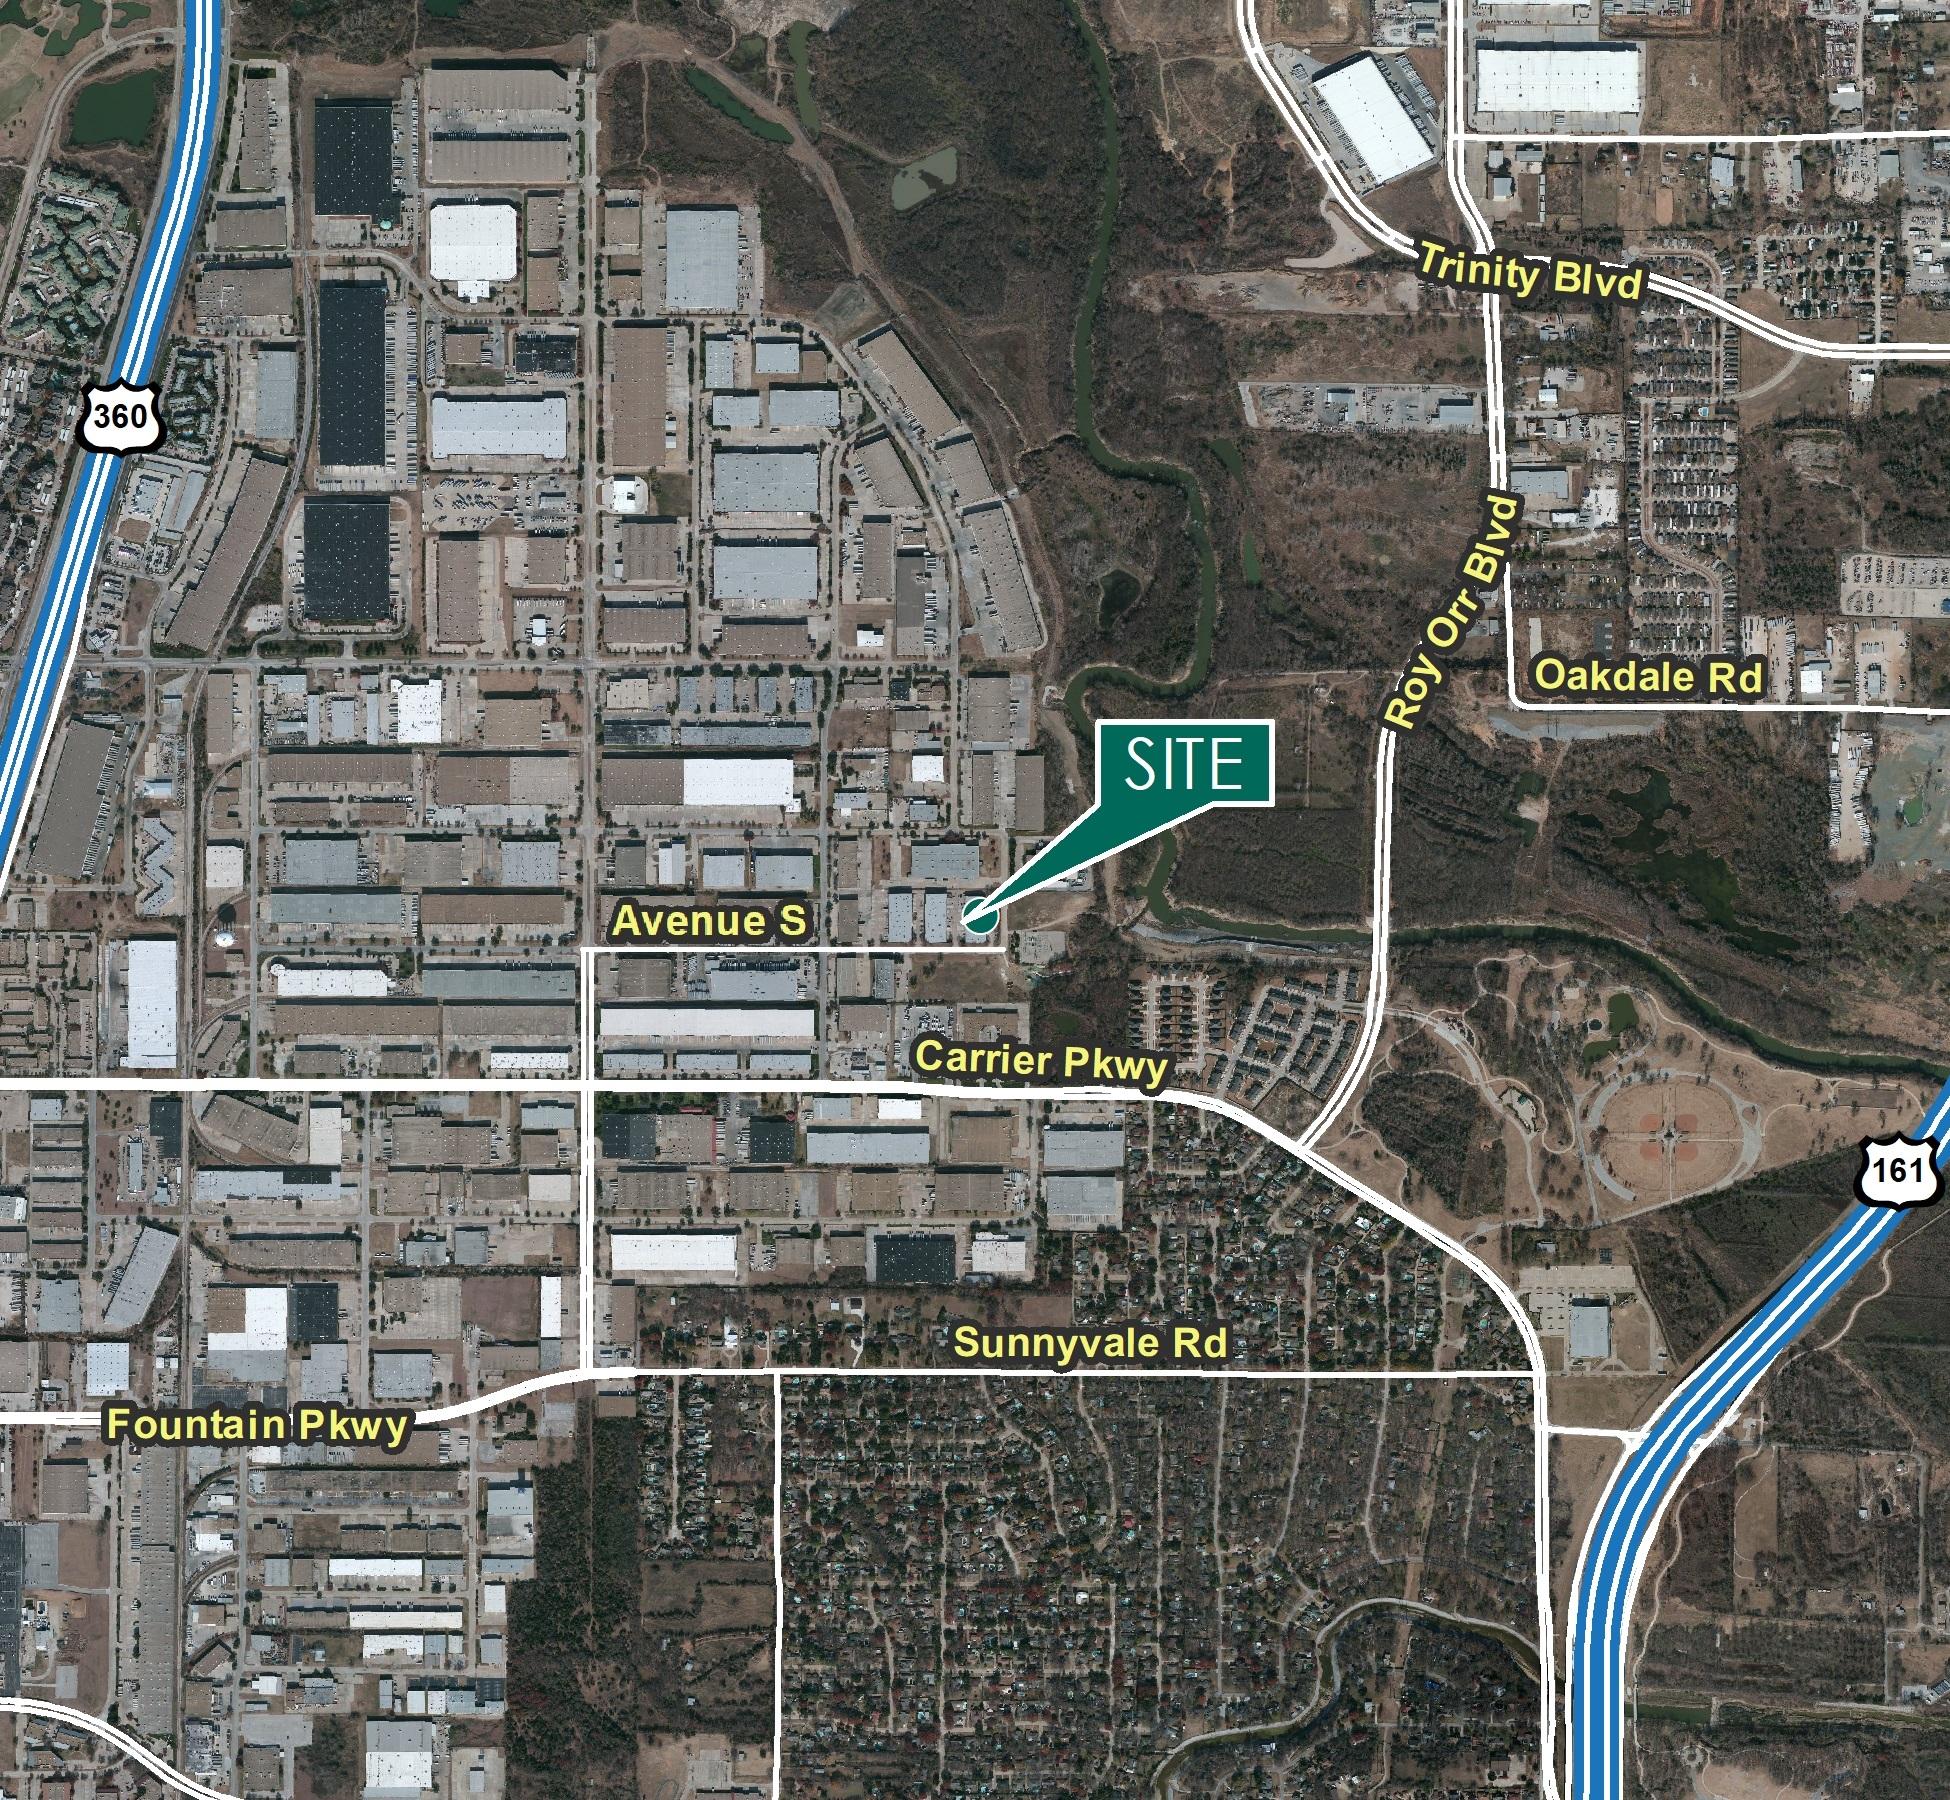 Prologis-Great-Southwest-74-DAL01774-1555-Avenue-S_AerialMap.jpg